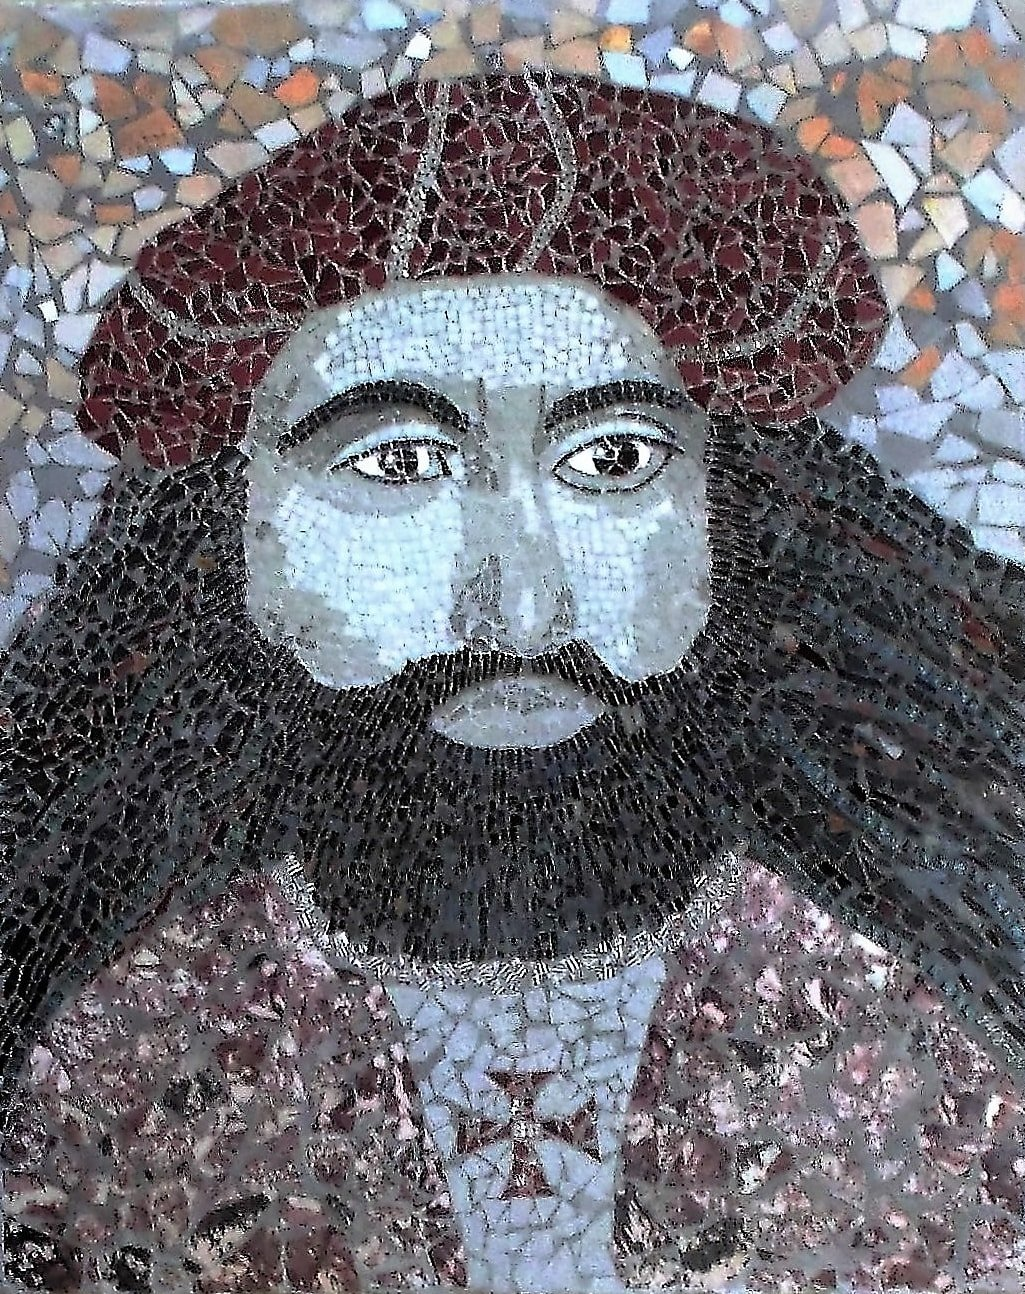 Mosaic portrait of Vasco da Gama by Mosaics Lab